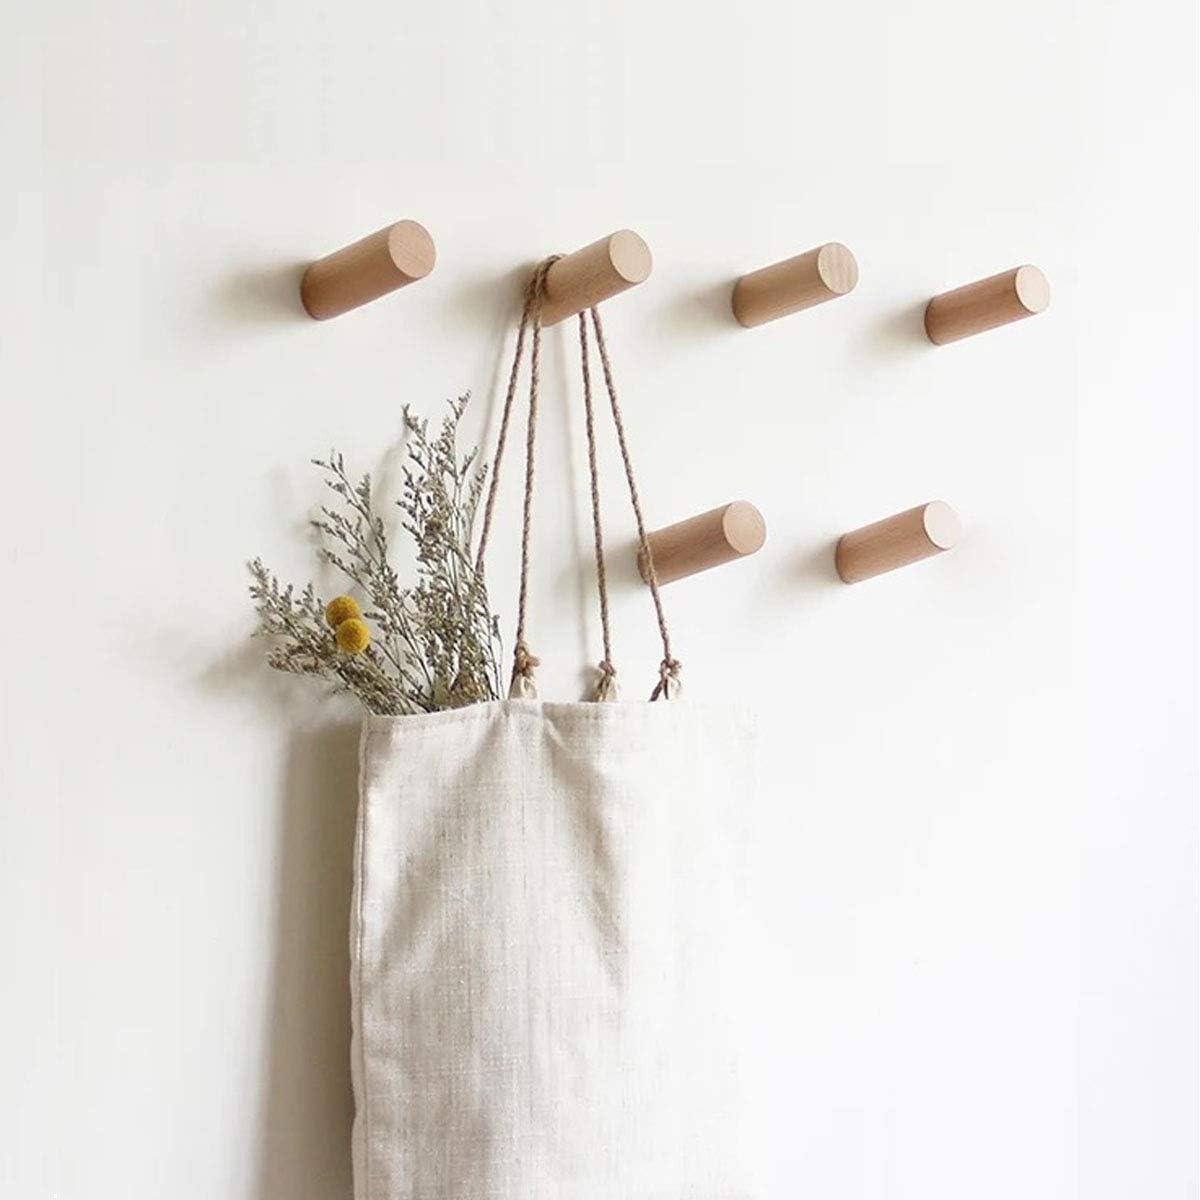 HomeDo 5 Pack Wooden Coat Hooks Wall Mounted, Single Organizer Hat Rack, Vintage Handcraft Hanger (Beech Wood 5Pcs, 3inch)